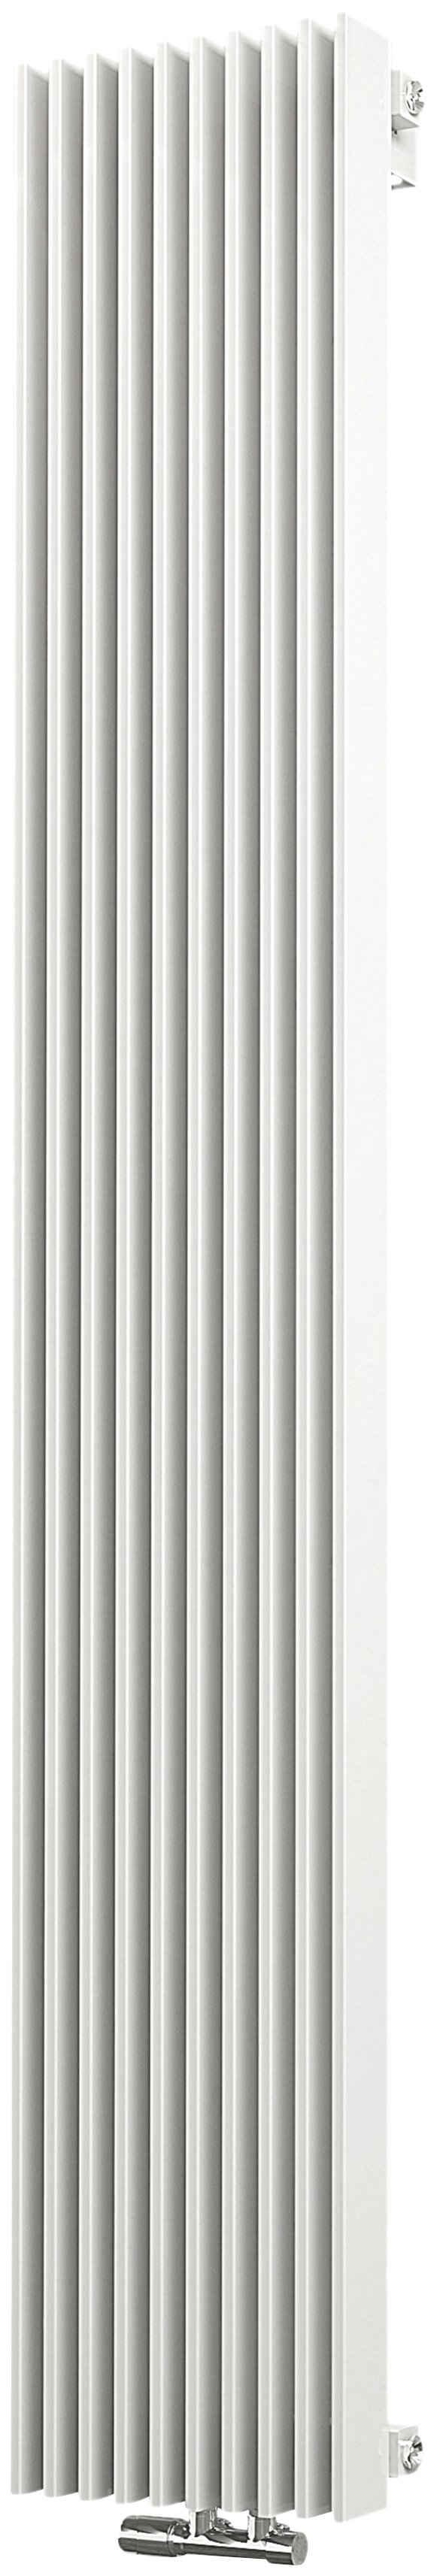 Schulte Heizkörper »London«, 180 x 29,5 cm